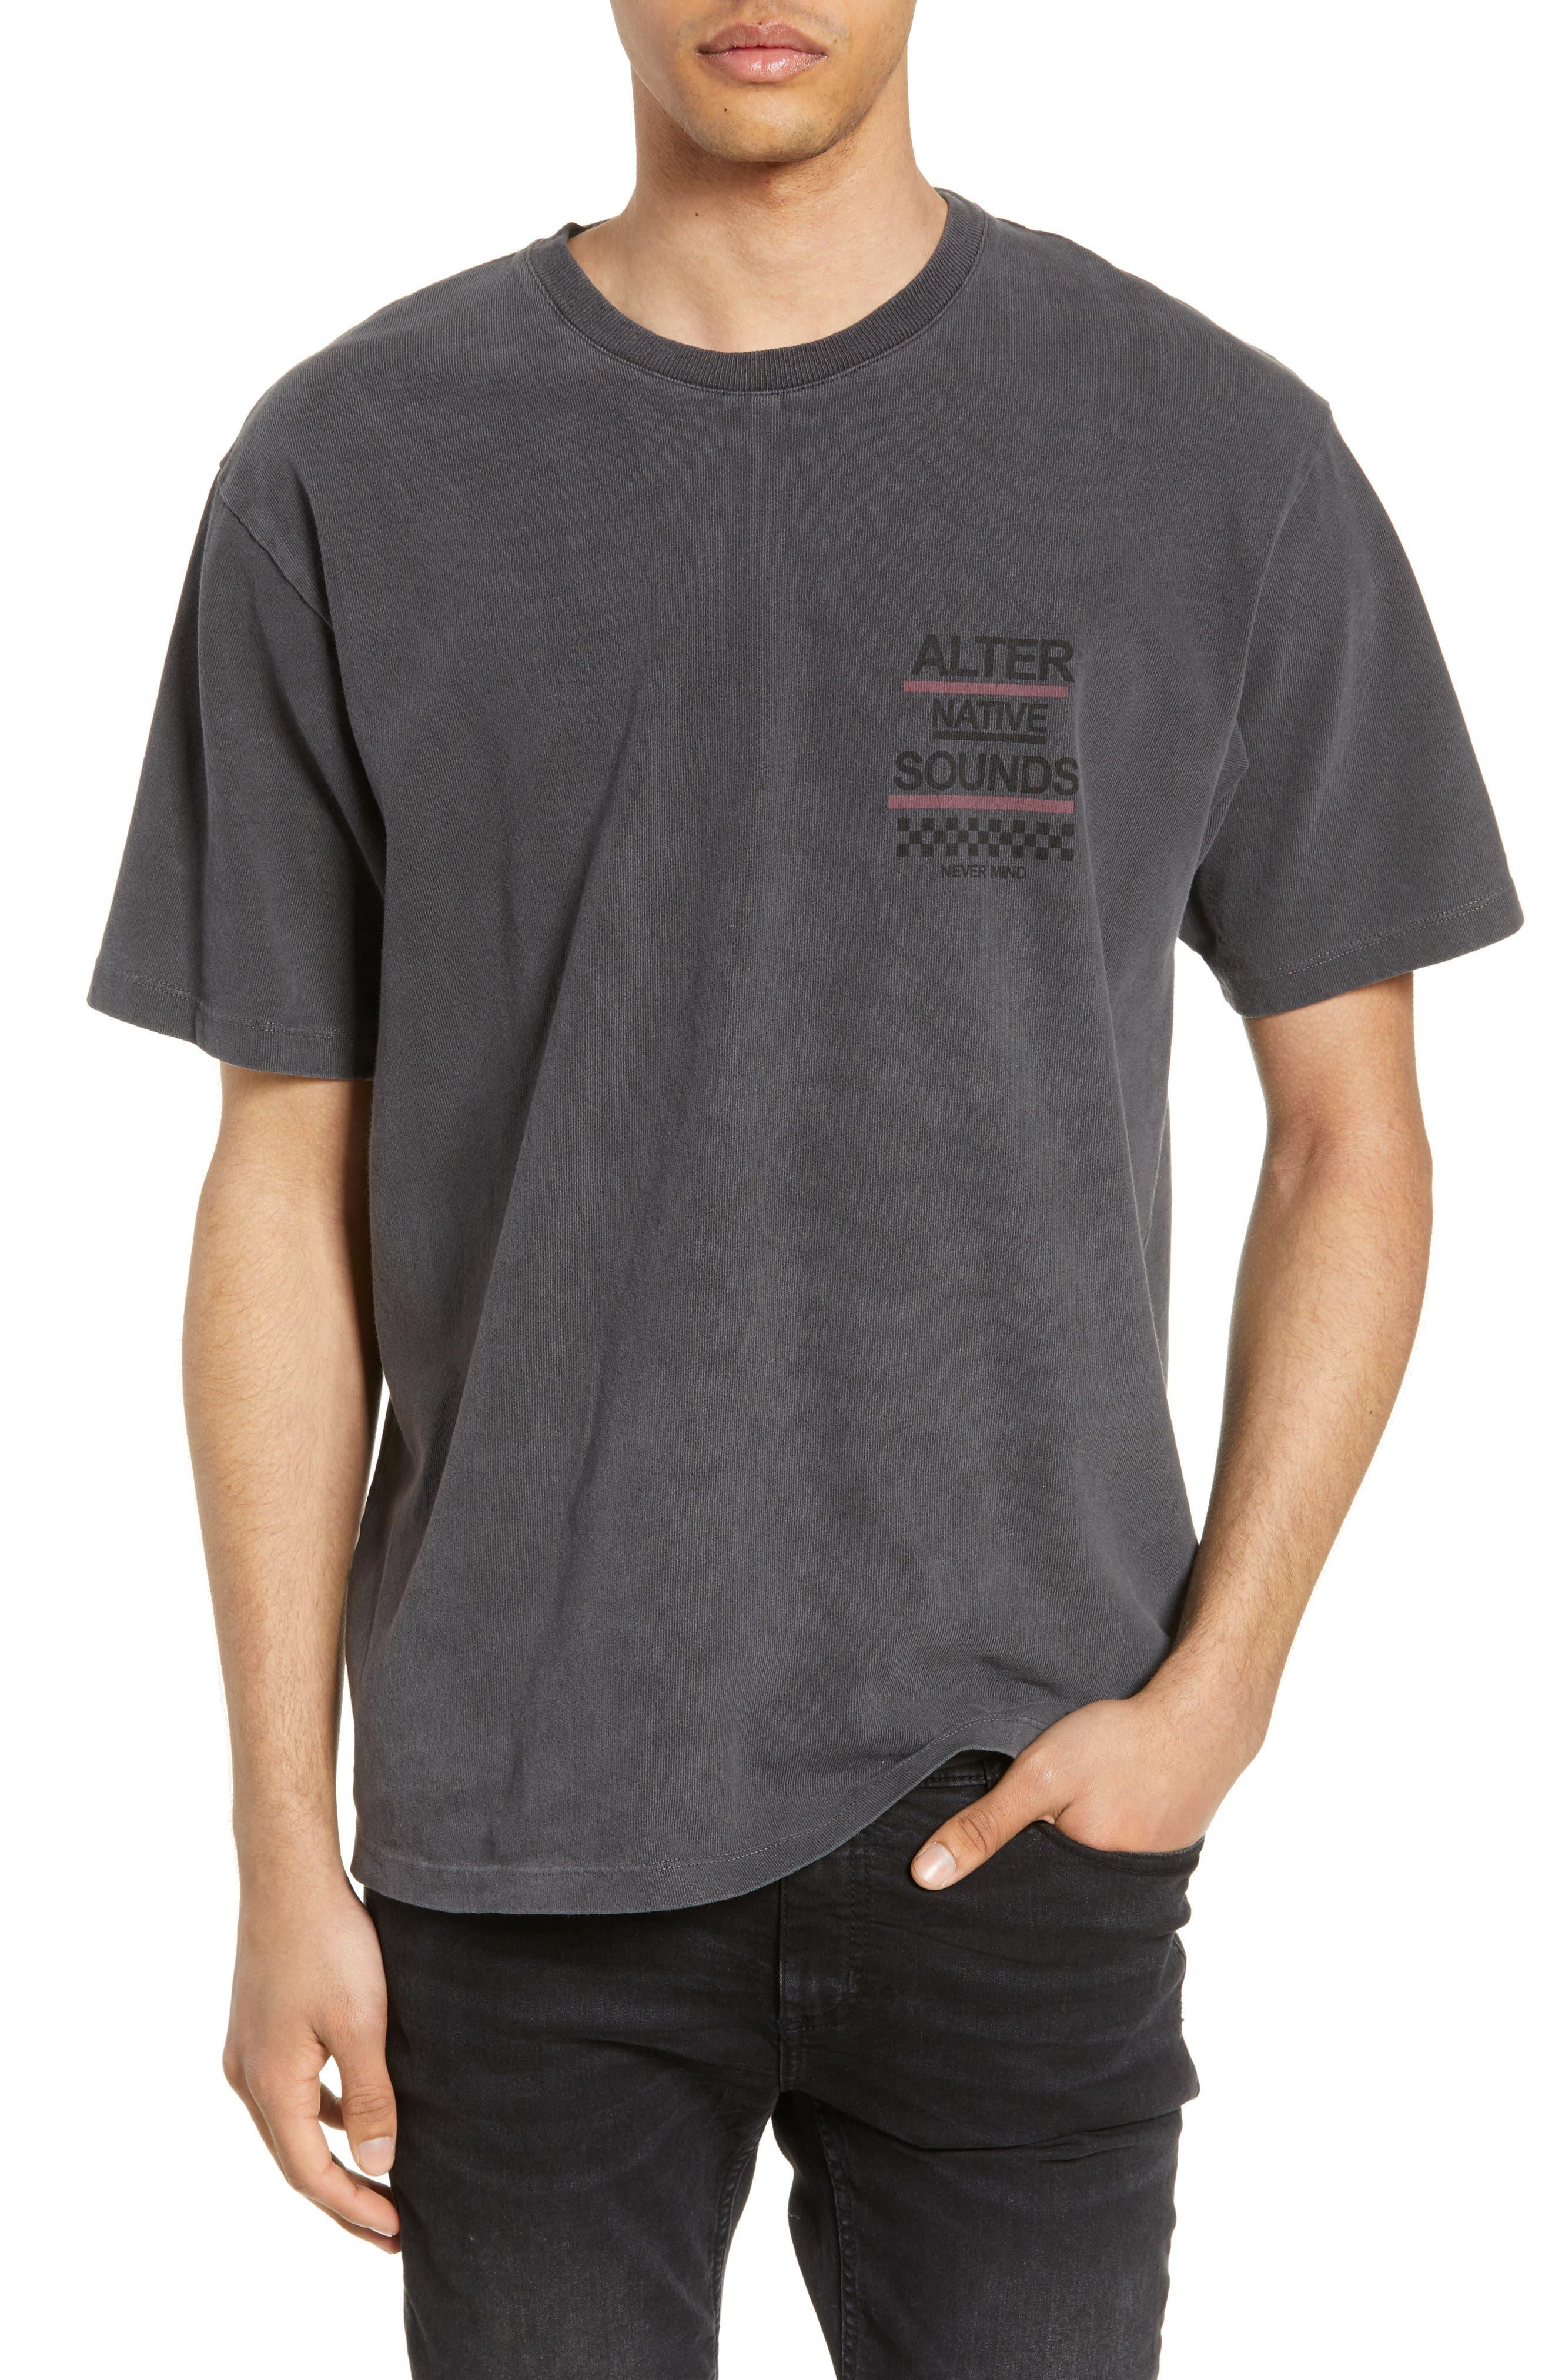 THE KOOPLES, Graphic T-Shirt, Main thumbnail 1, color, WASHED GREY